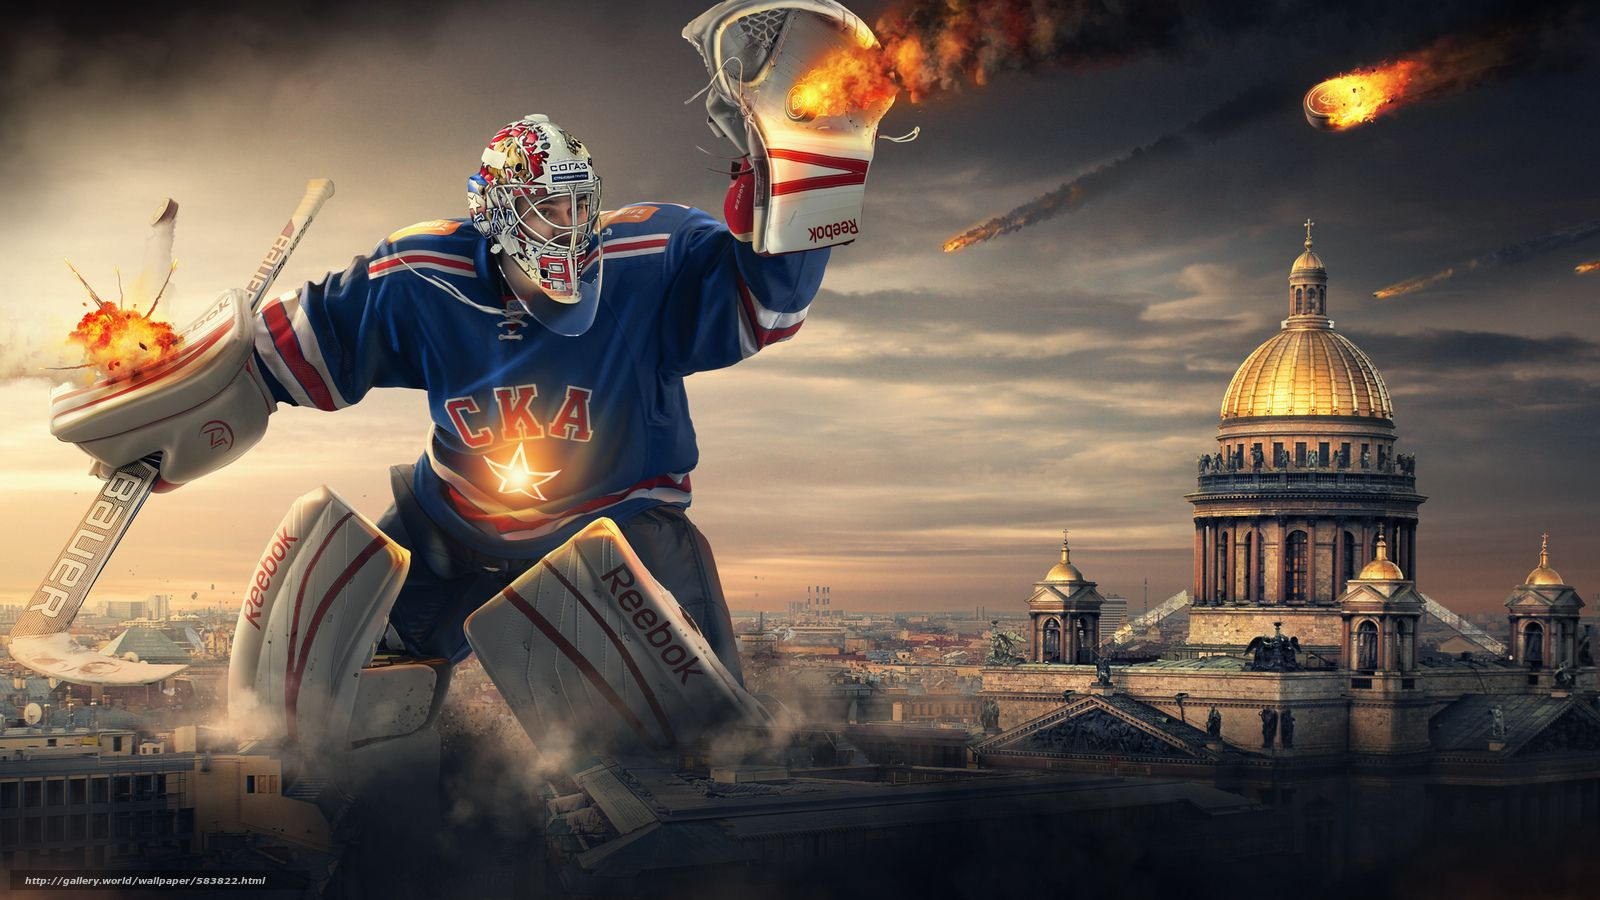 Ice Hockey Goalie Wallpaper Google Suche Vratar Hokkej Ska